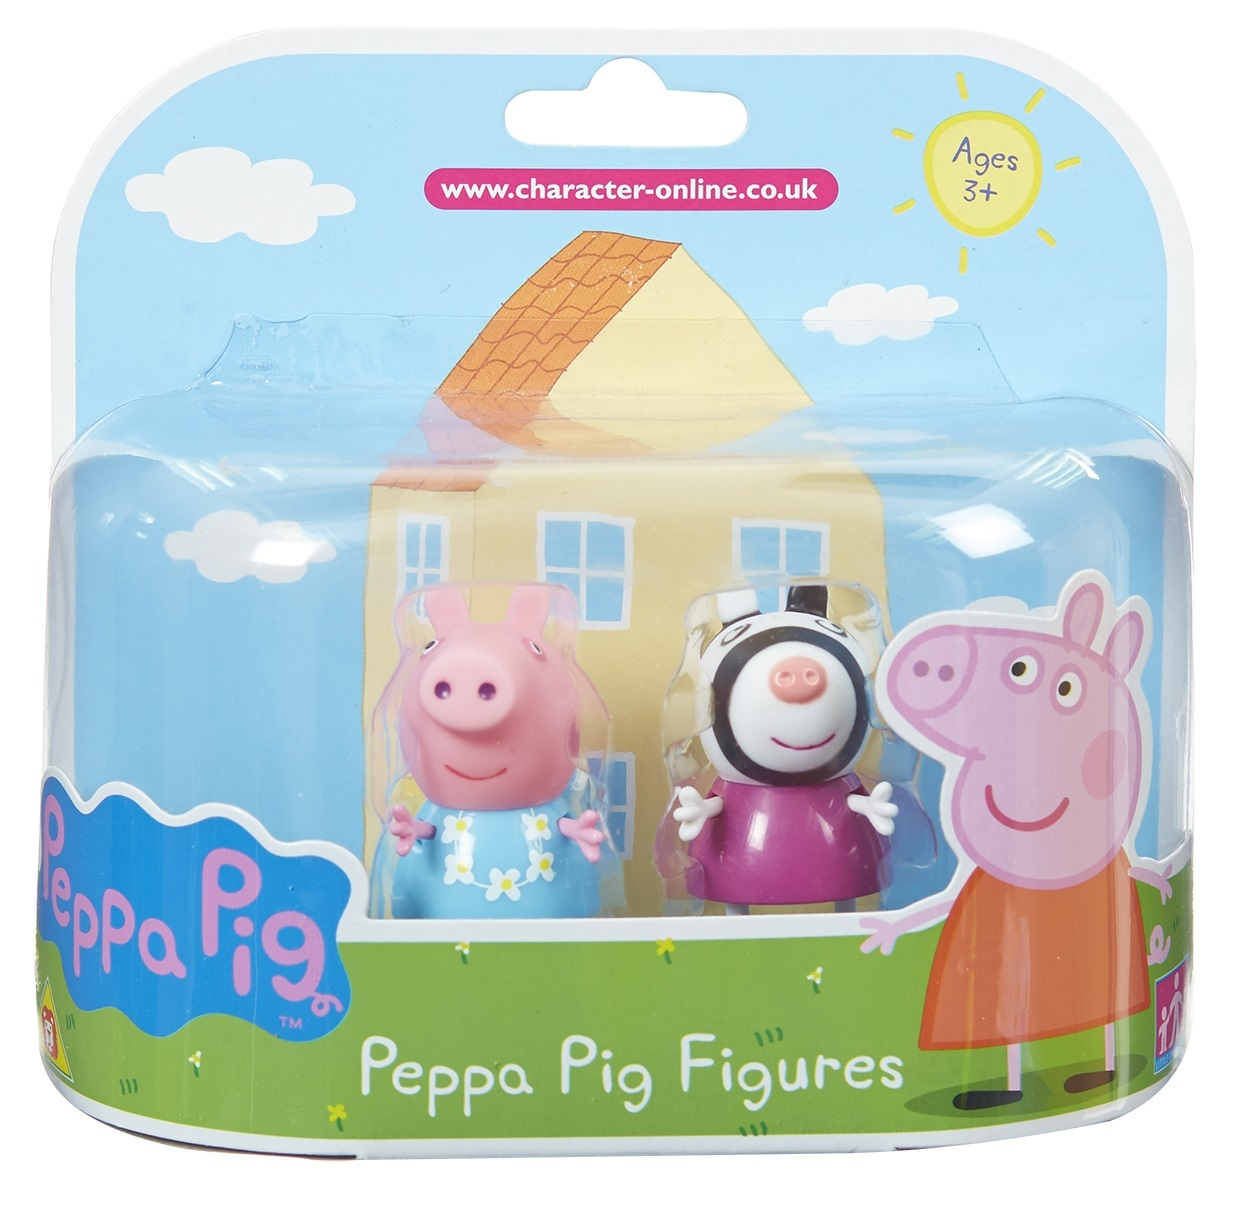 Peppa Pig Dress Zoe Zebra Toy At Mighty Ape Nz Powder Mix Green Tea Twin Pack Image